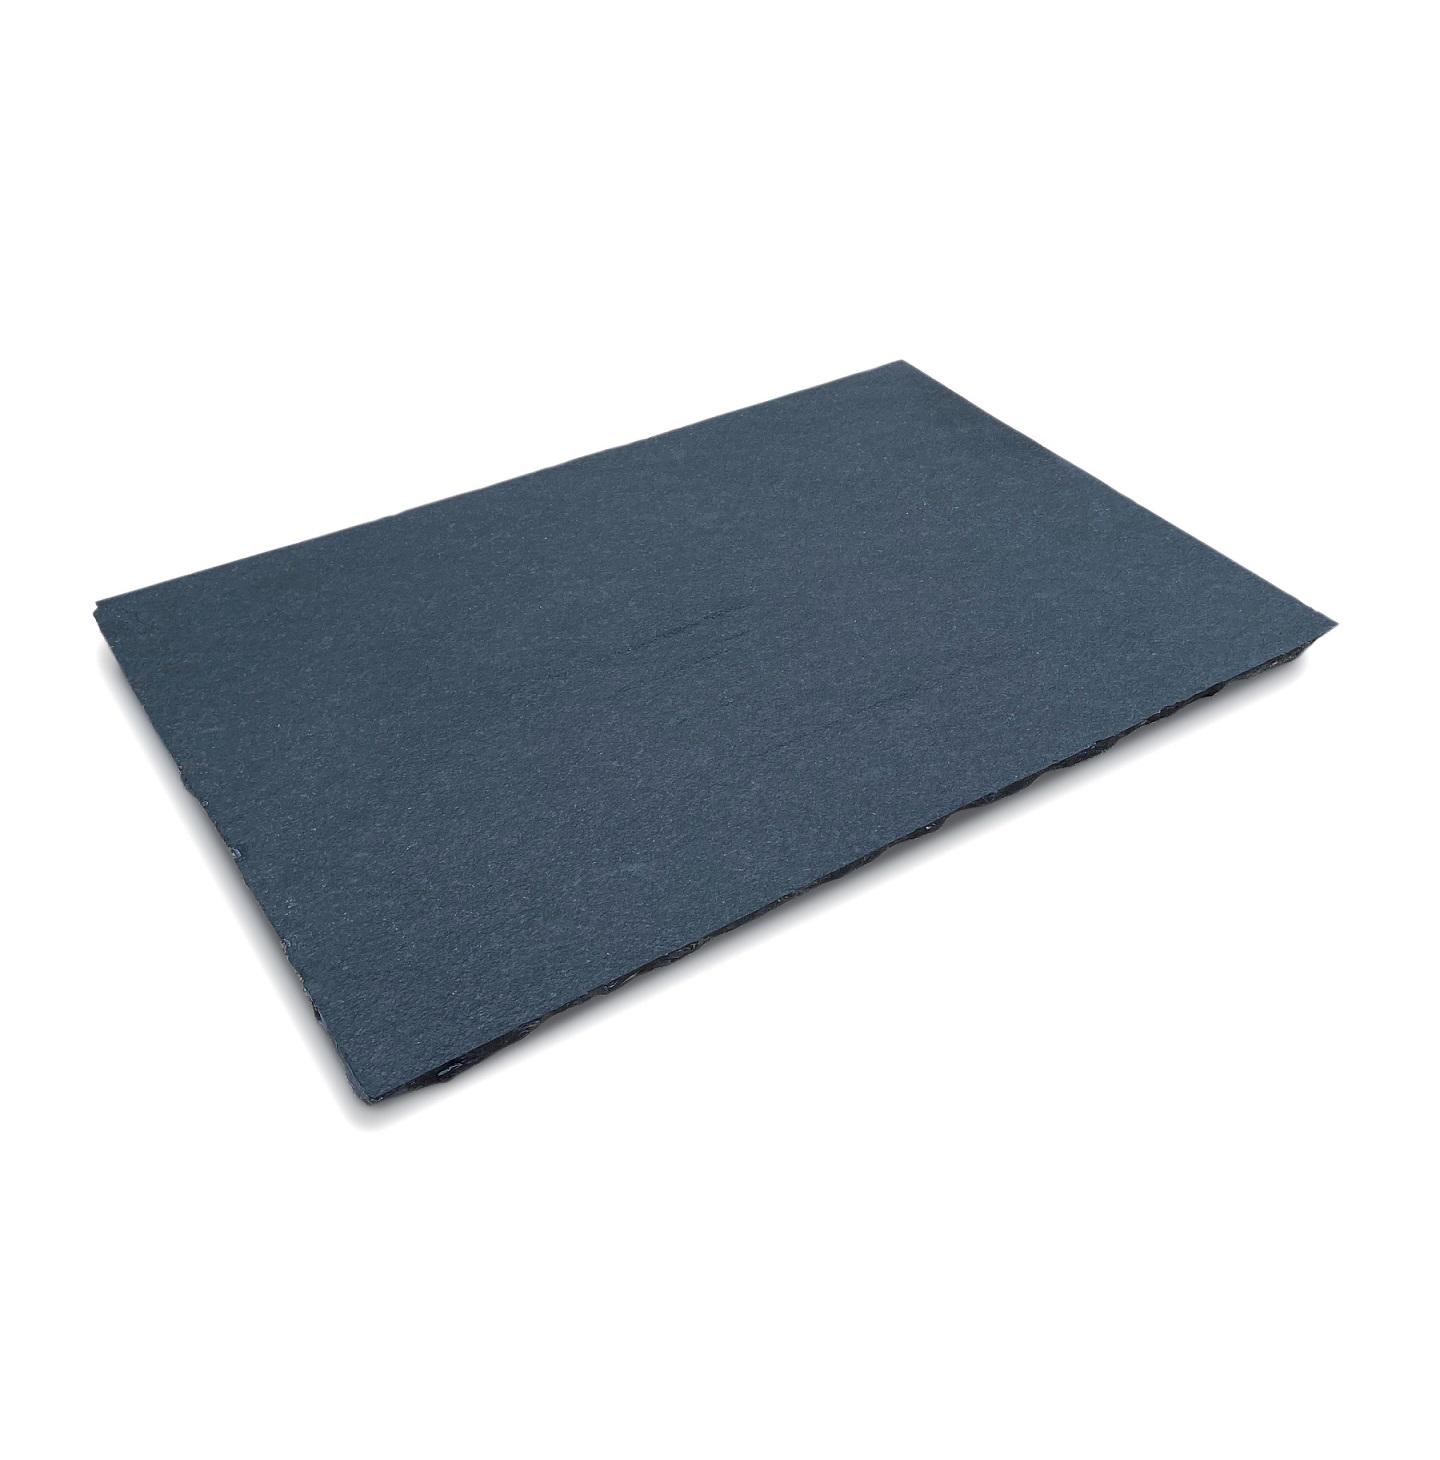 Chipped edge black limestone hearth slab